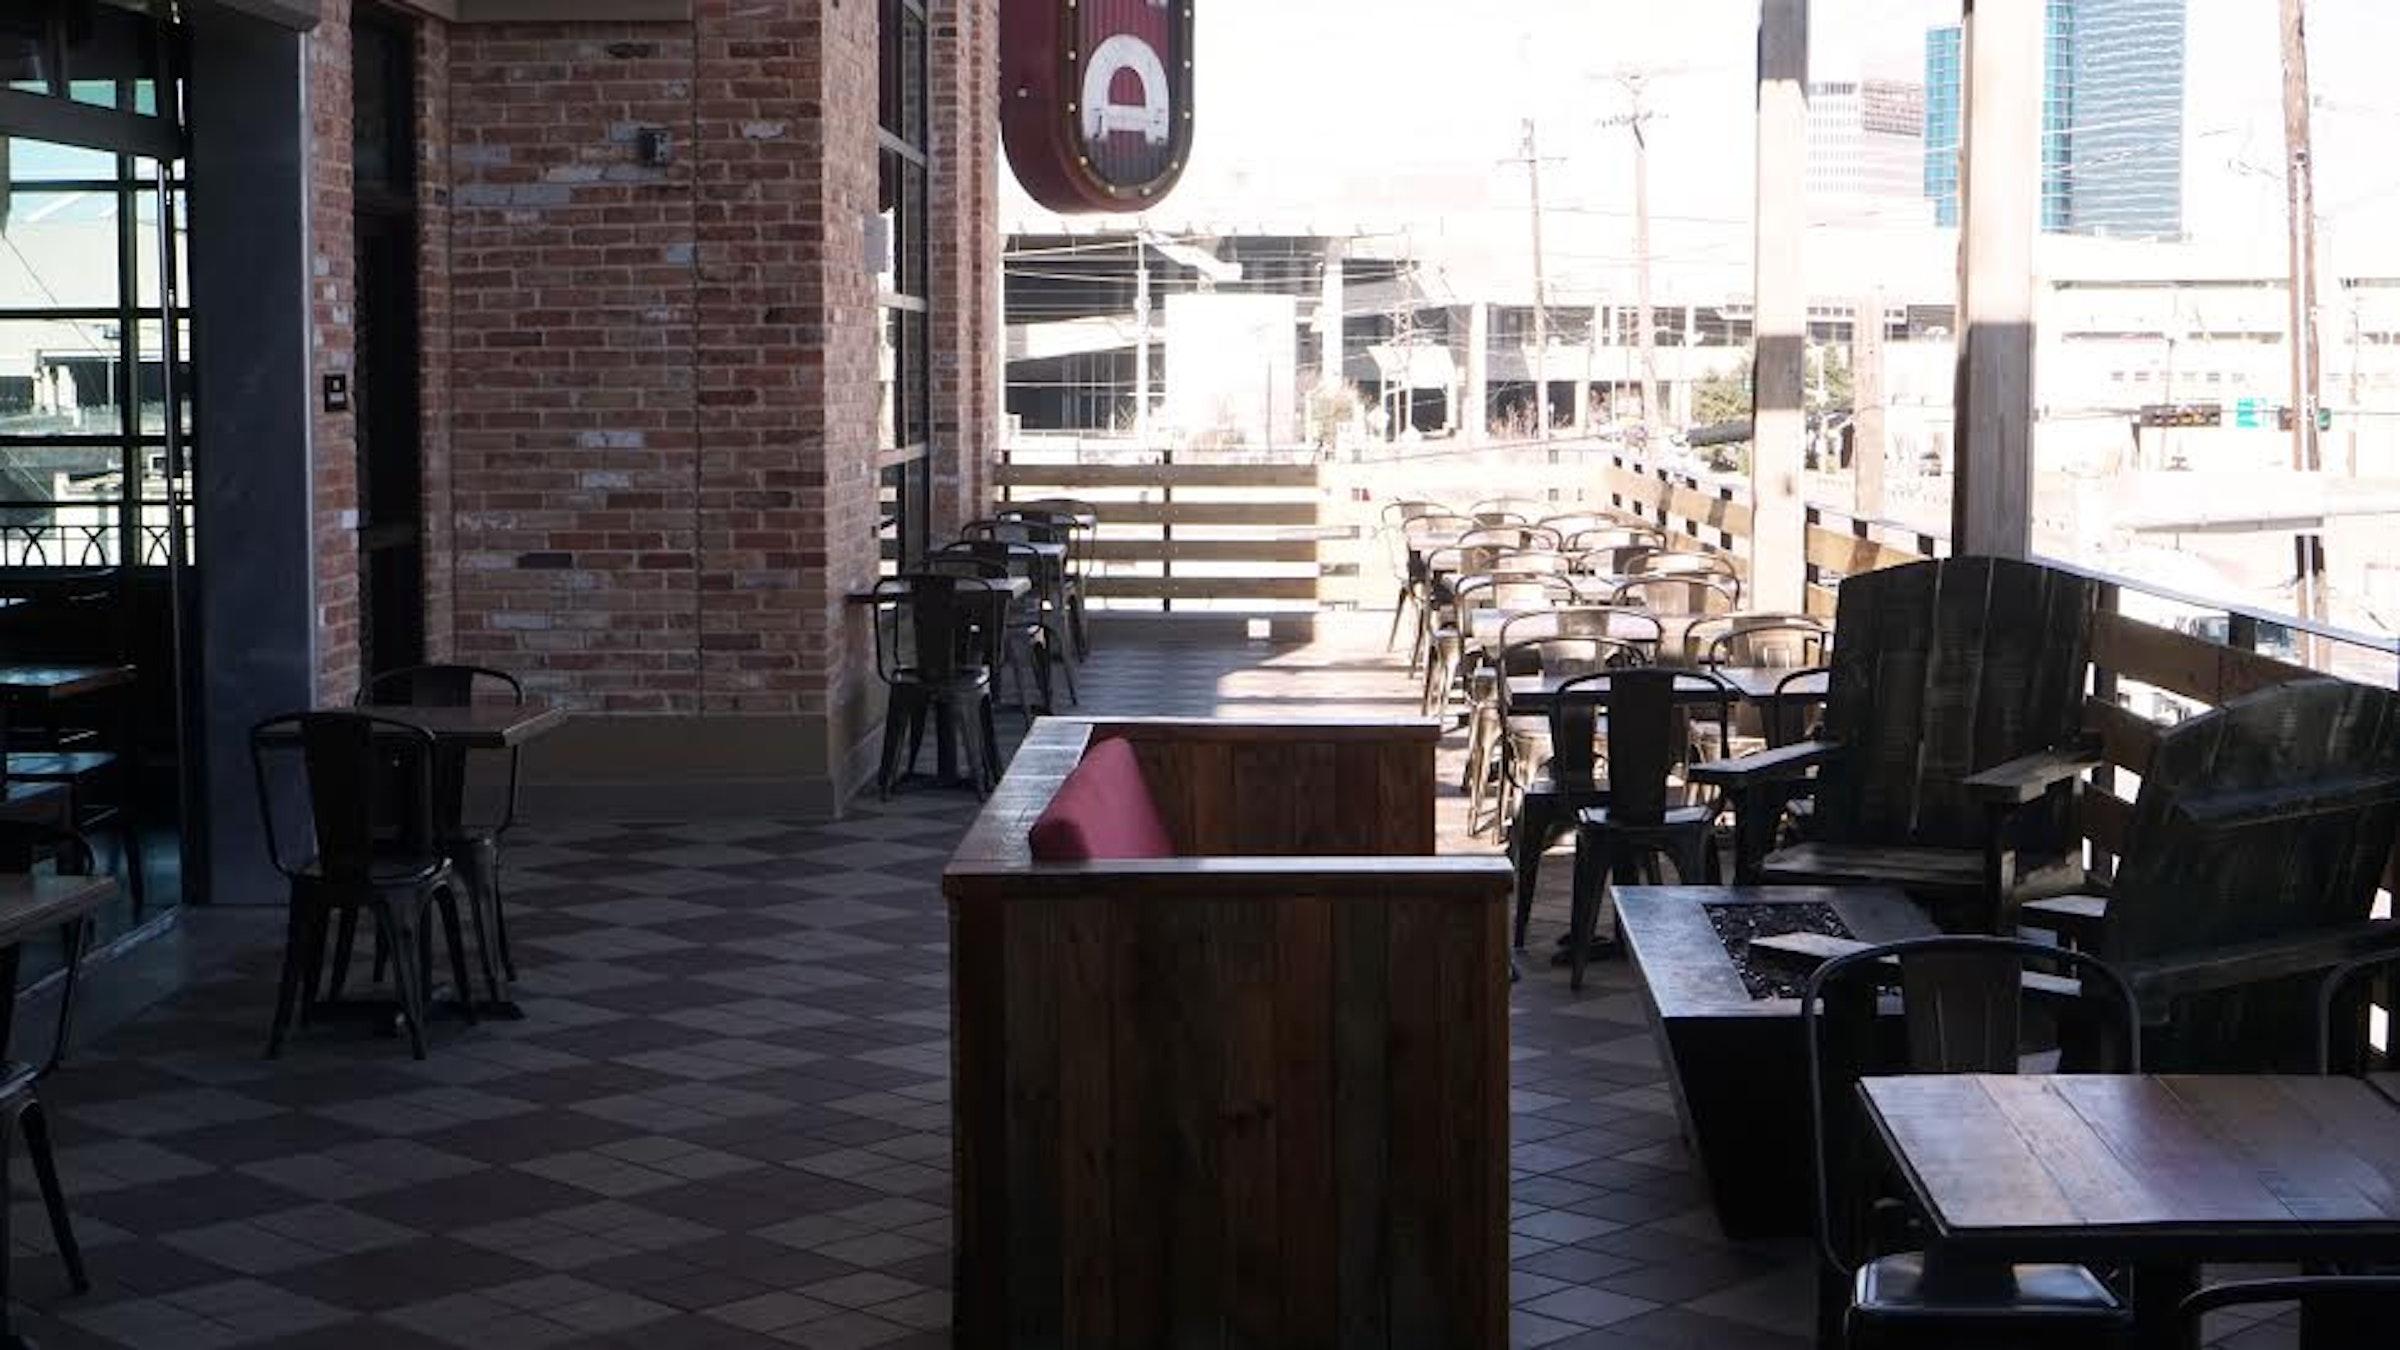 Alamo Drafthouse Cinema Cedars in Beyond Dallas